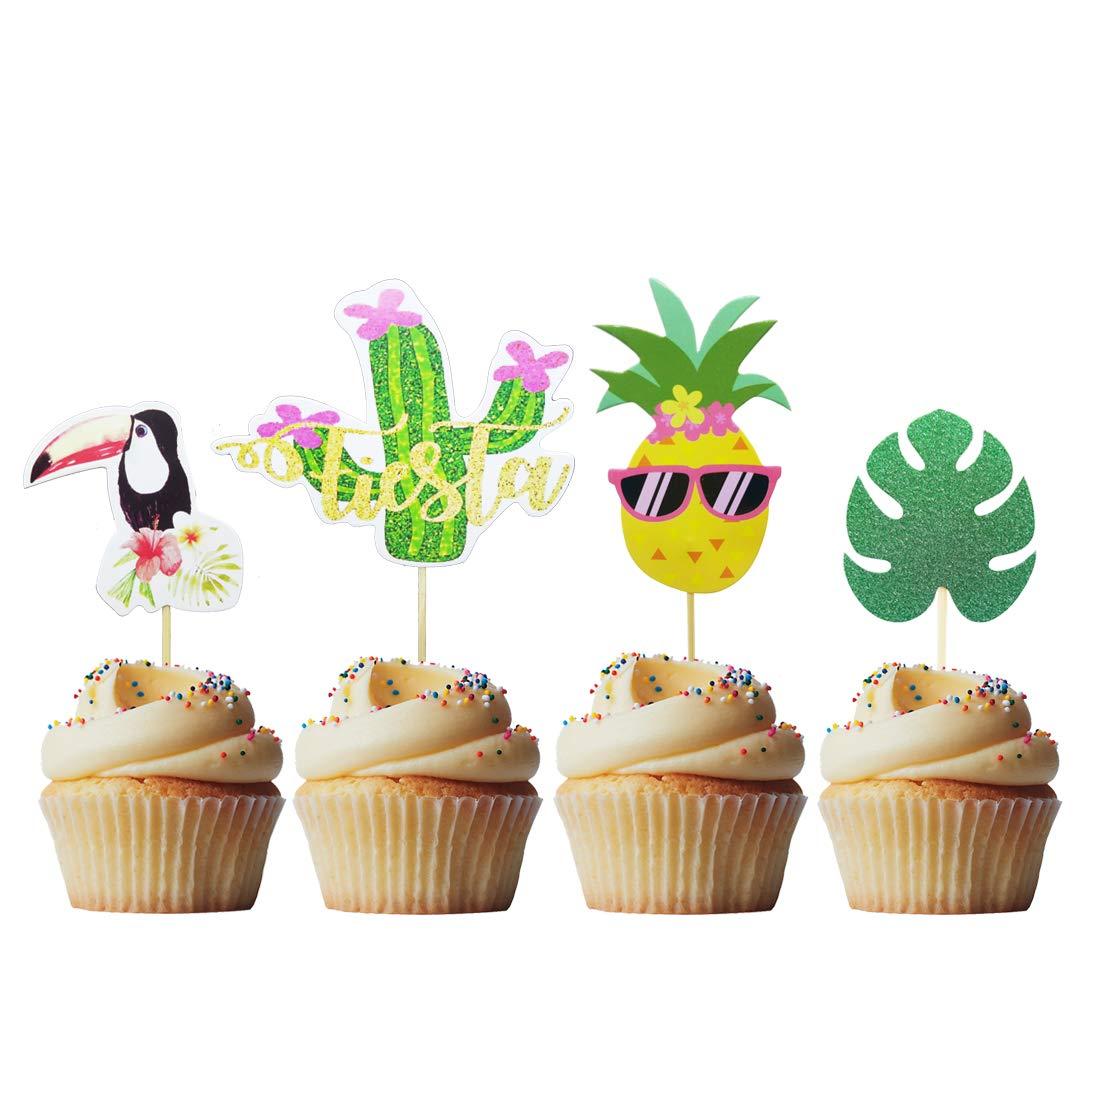 20pcs Glitter Paper Happy Birthday Party Cake Topper Muffin Fruit Cupcake Picks